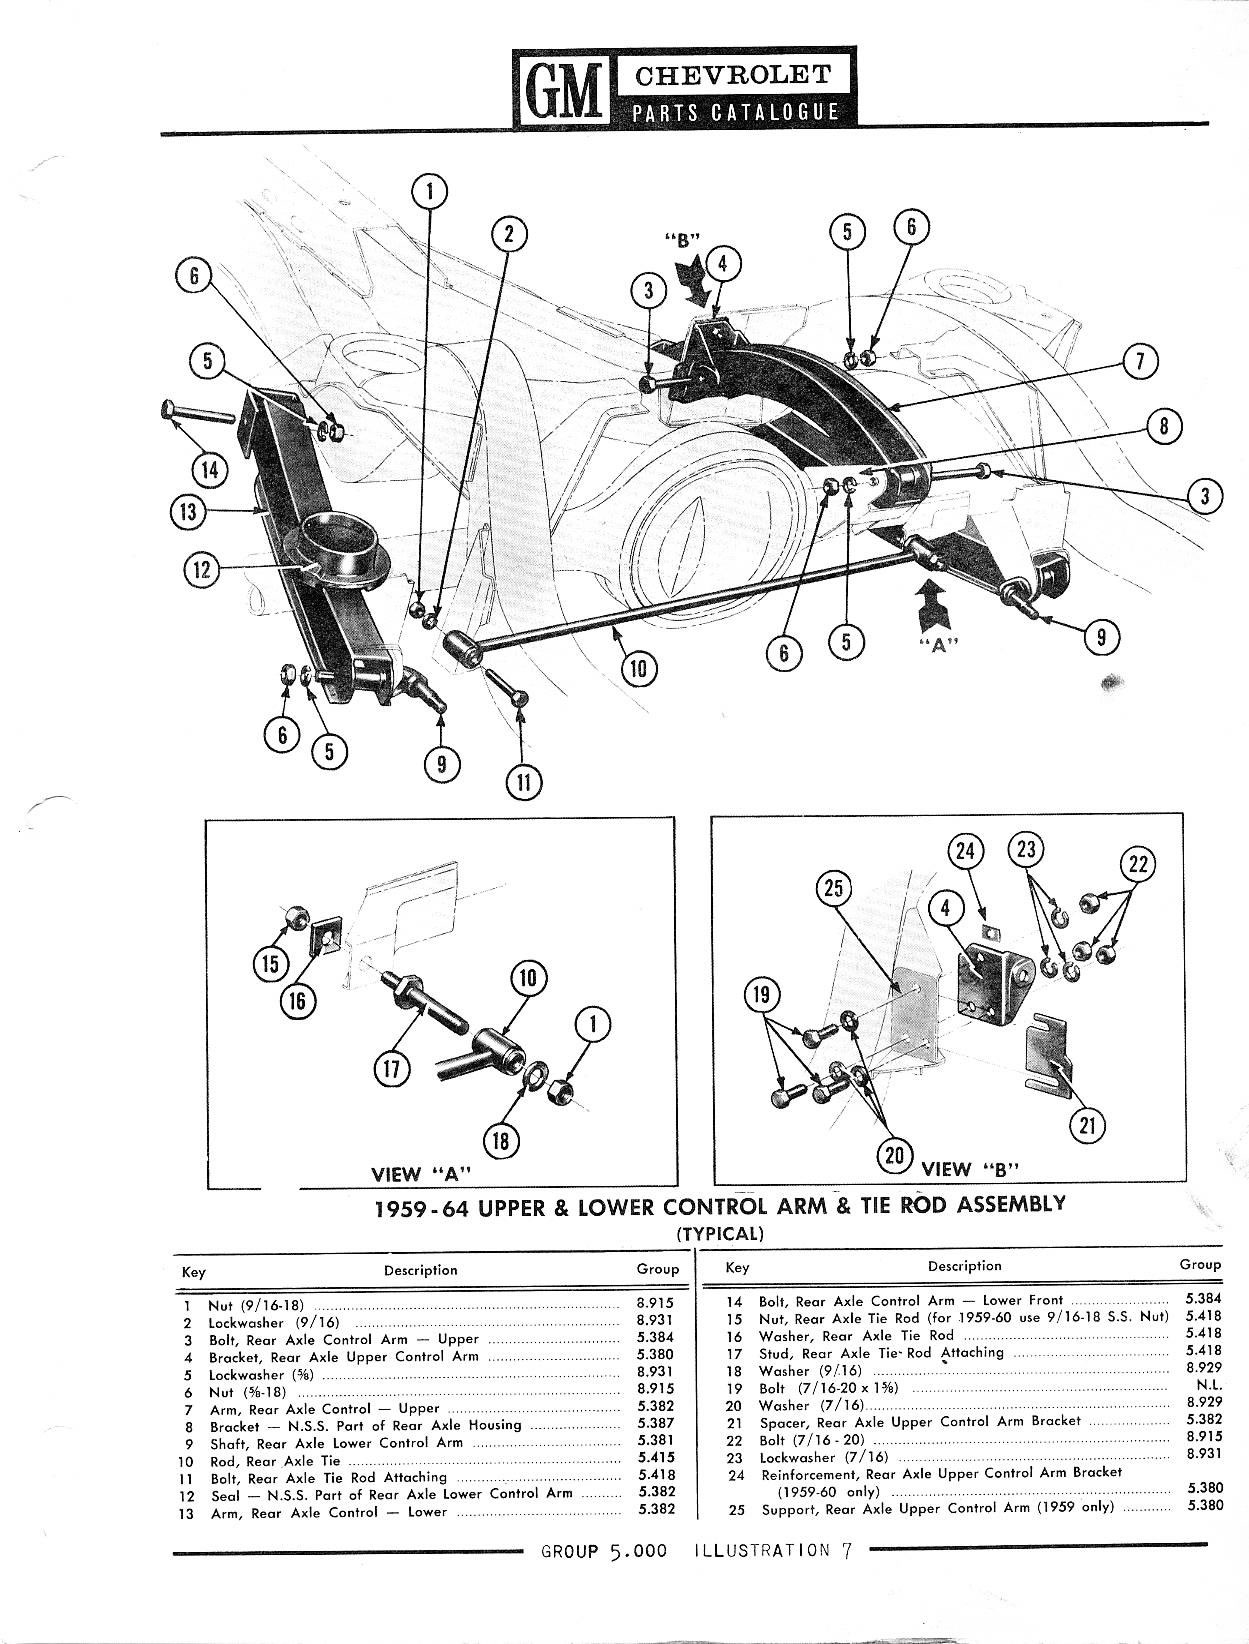 1958-1968 Chevrolet Parts Catalog / Image24.jpg